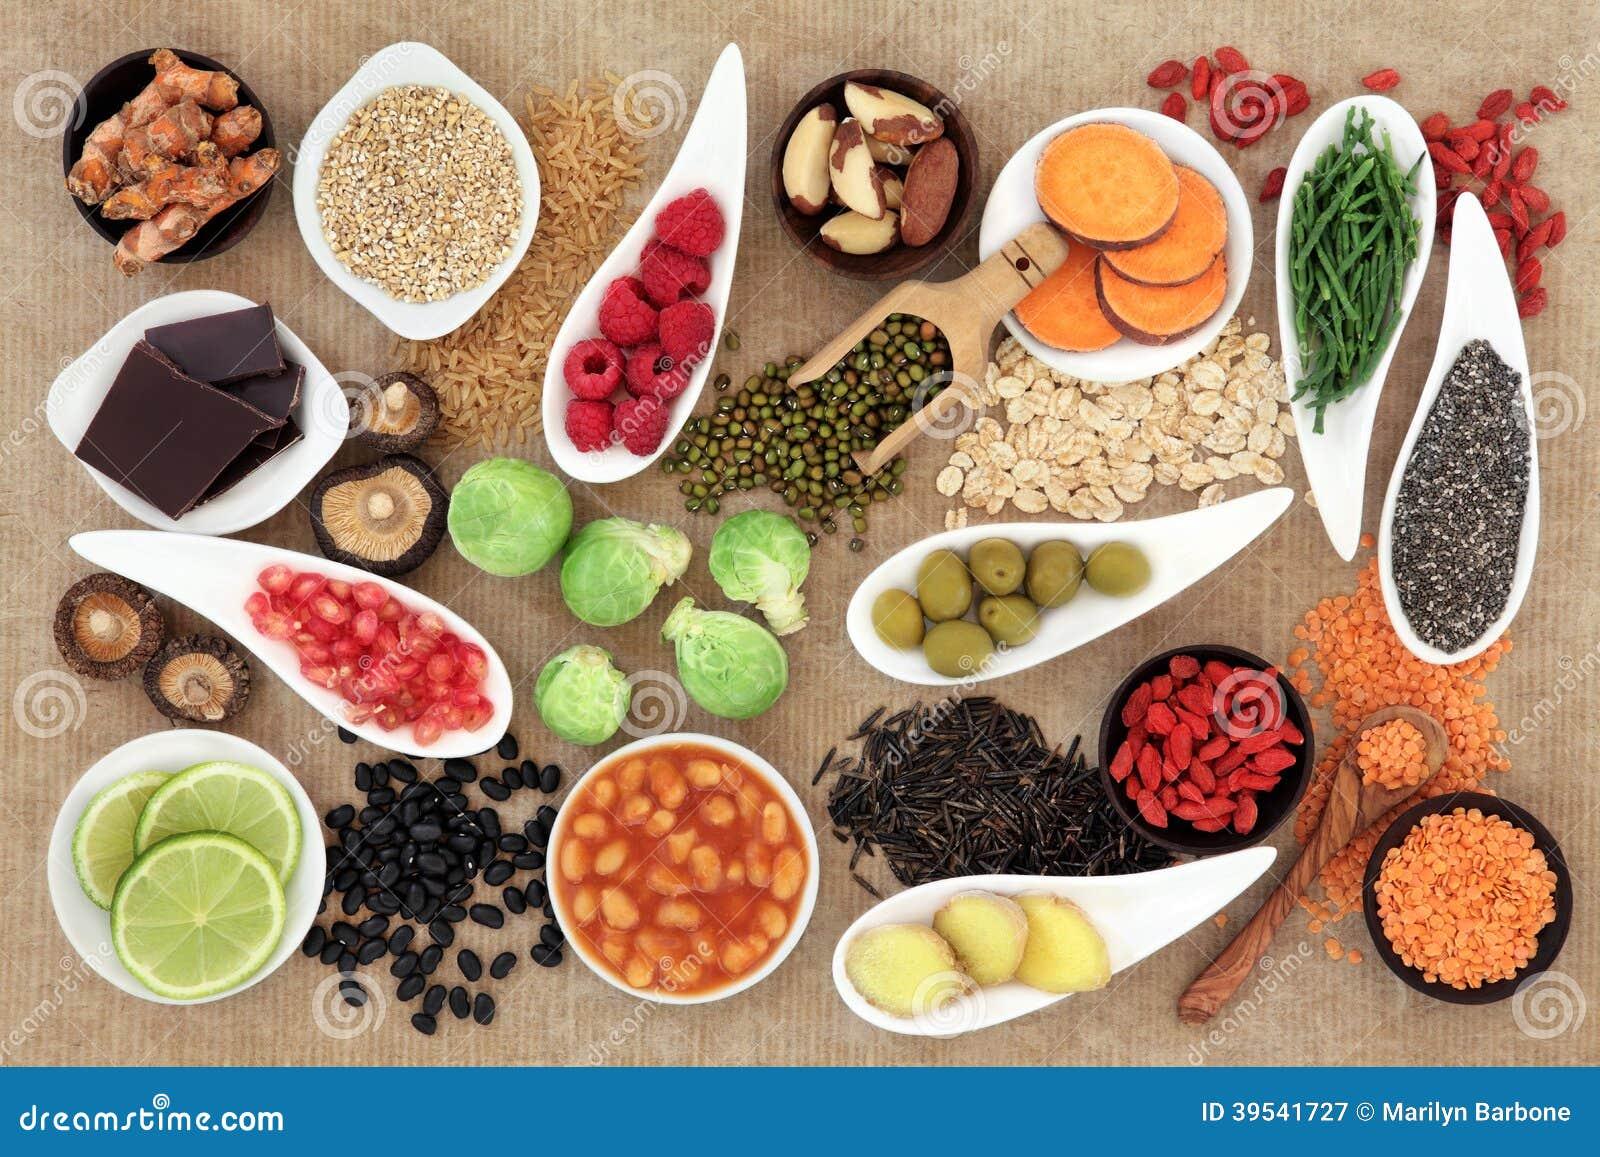 Health Food Stock Photo - Image: 39541727